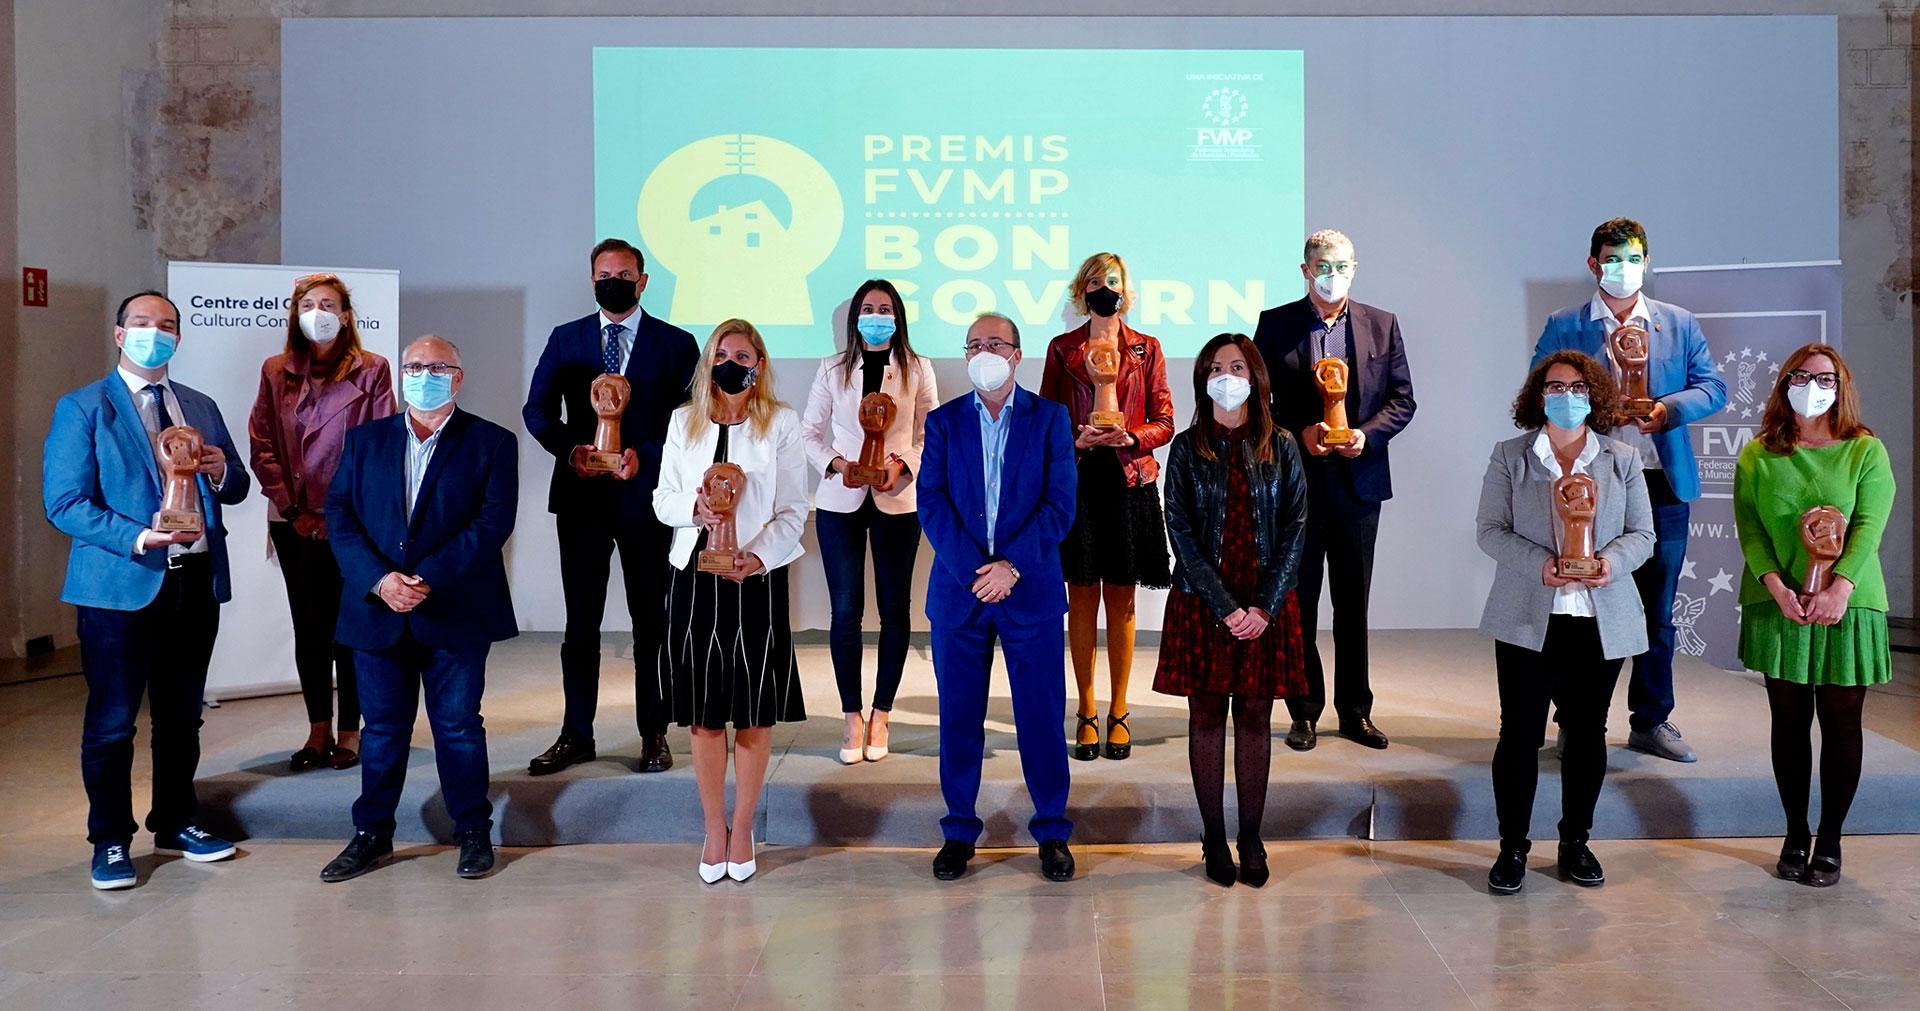 Premis FVMP Bon Govern 2019